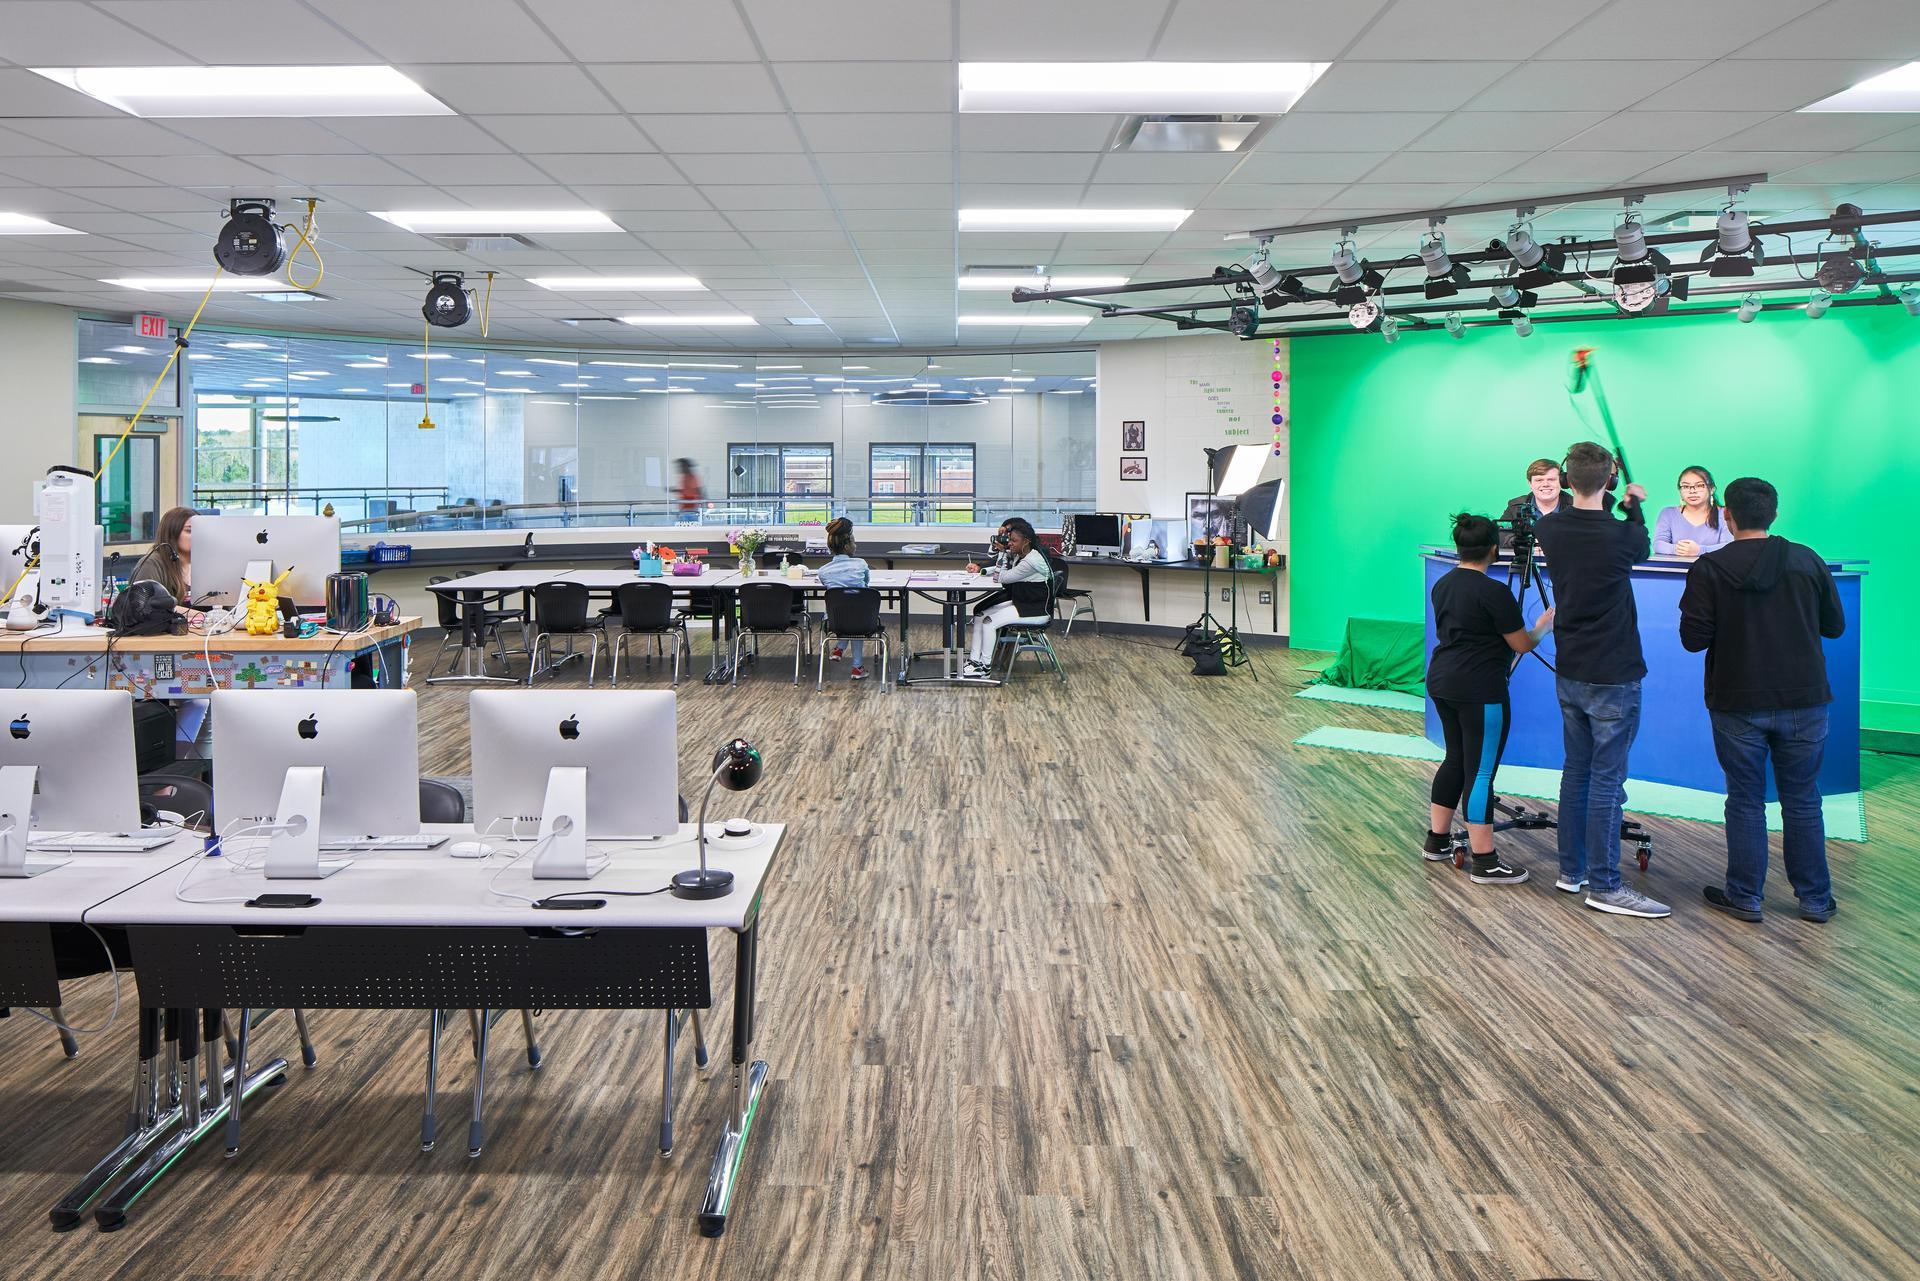 Lexington 2 Innovation Center Multimedia and Animation Classroom Studio